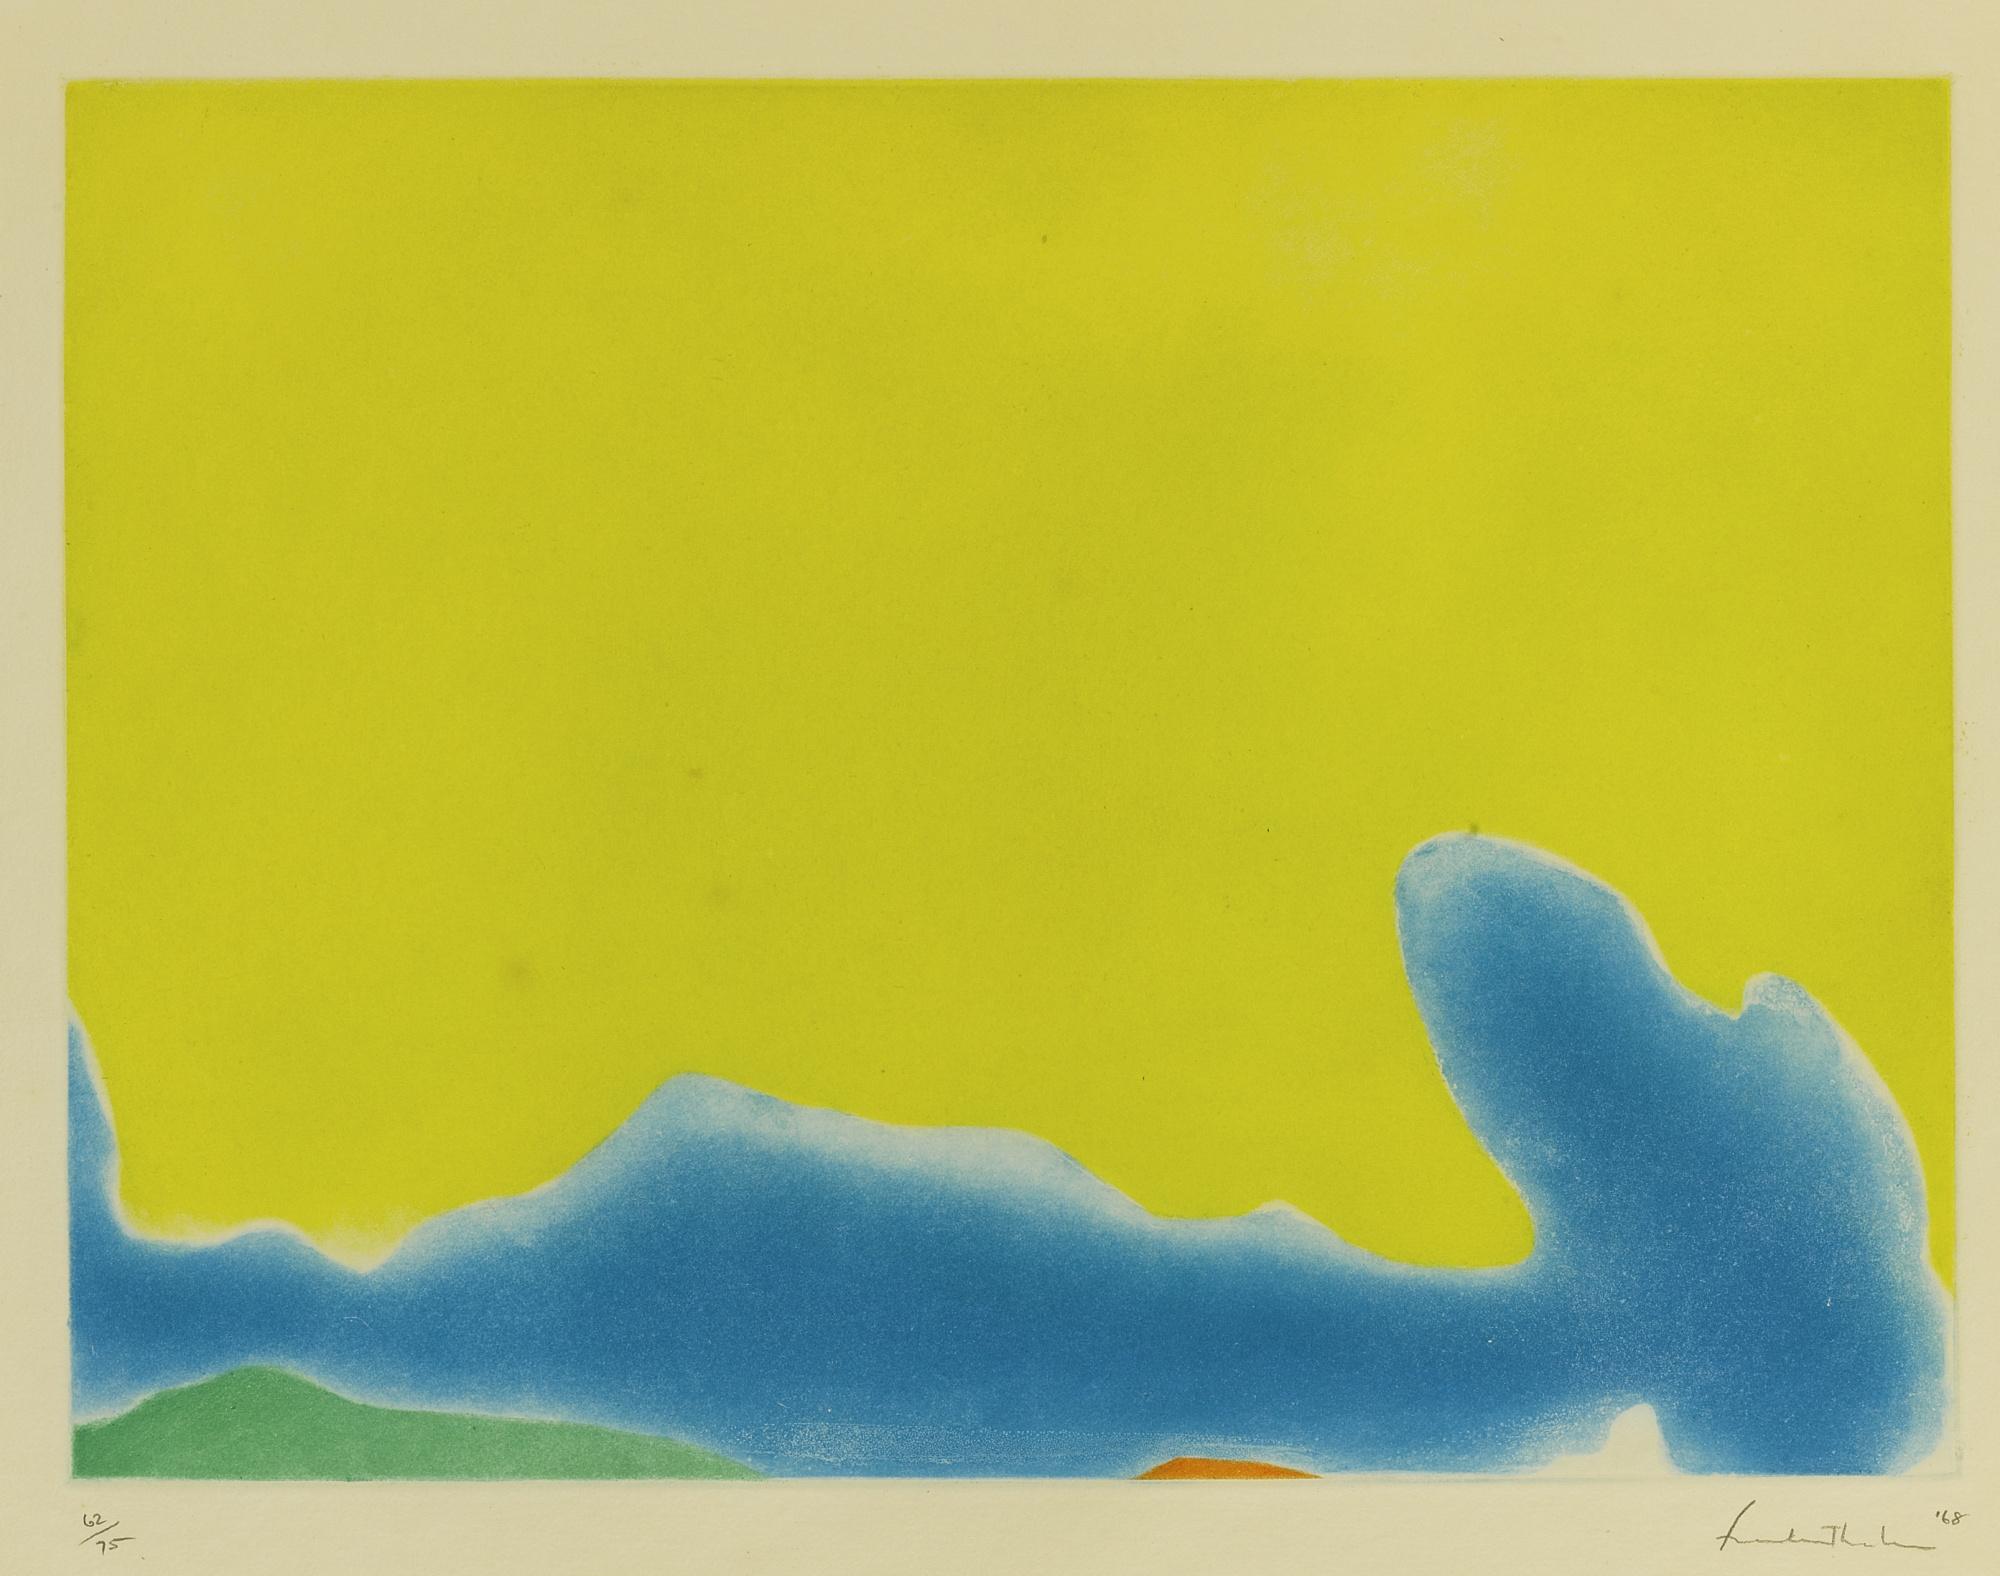 Helen Frankenthaler-Yellow Span (Harrison 13)-1968